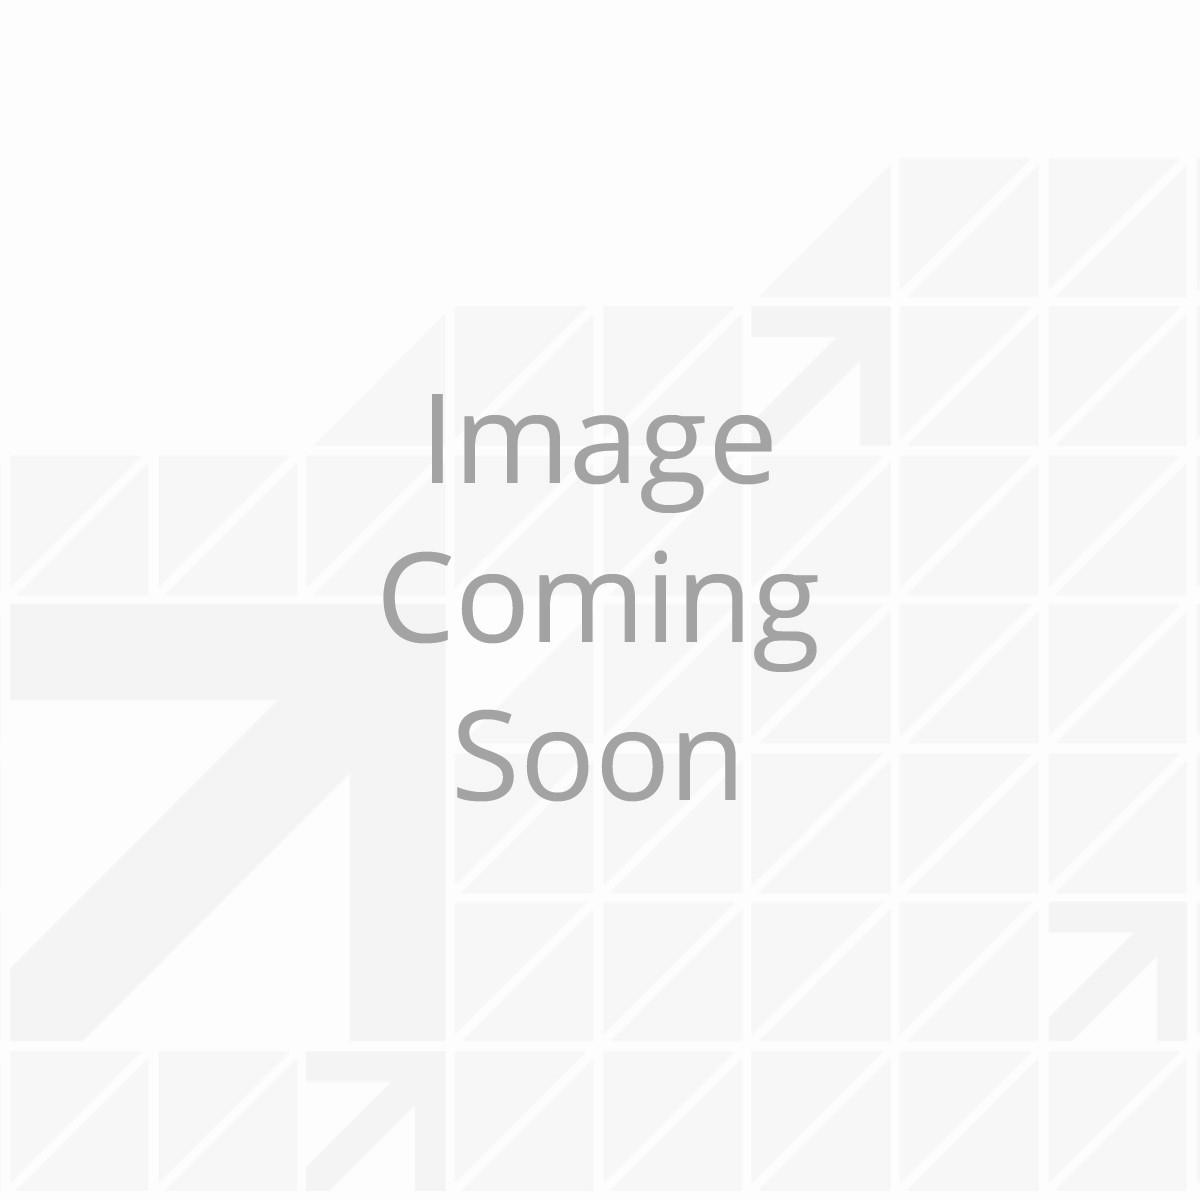 1824362_Crank-Handle_001